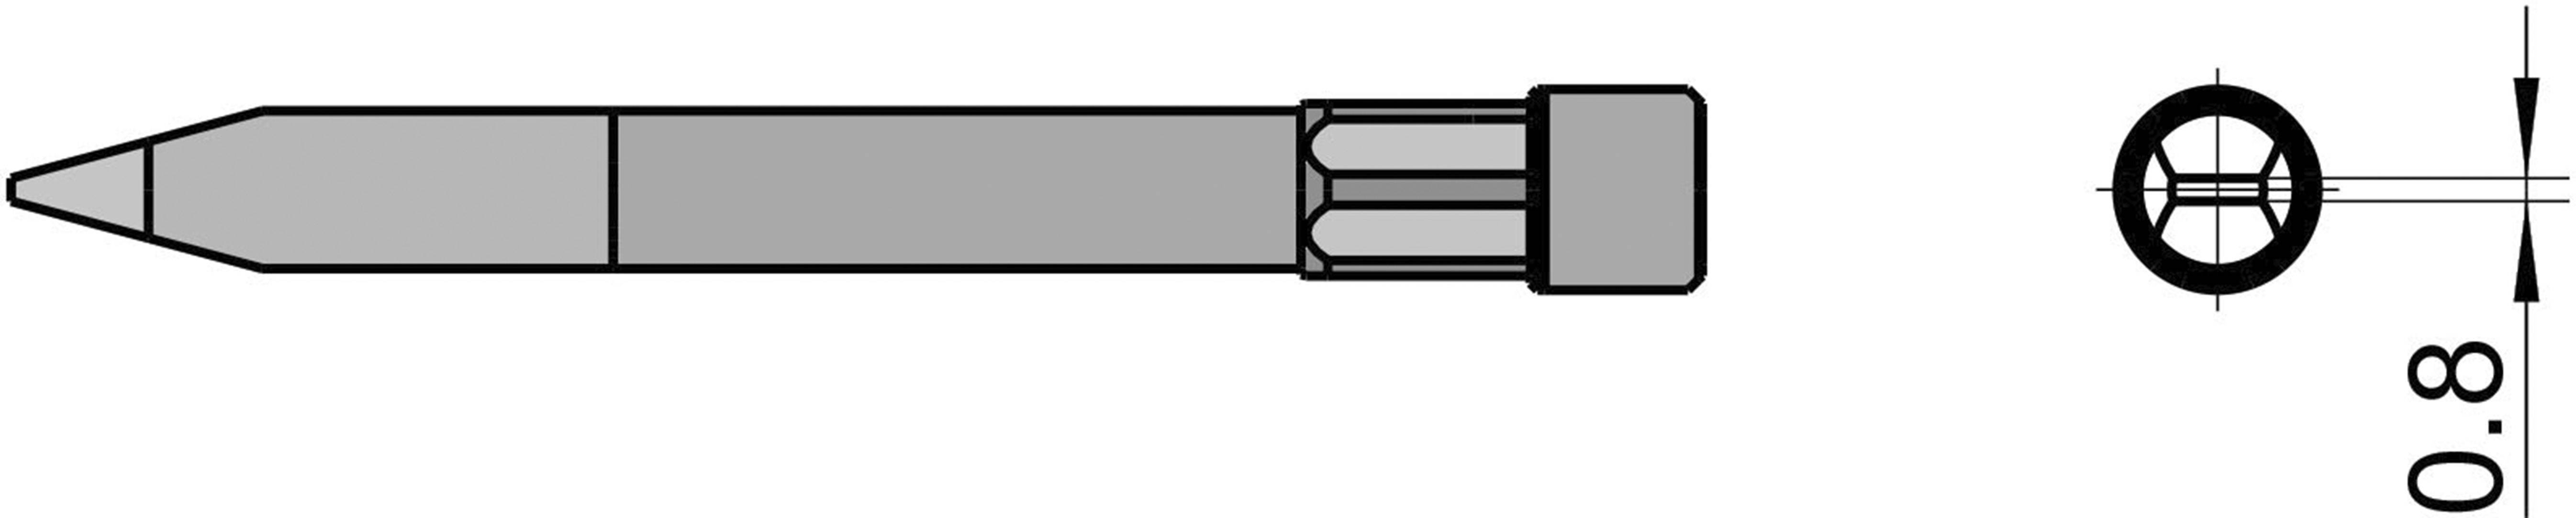 Spájkovací hrot dlátová forma Weller Professional T0054490699, velikost hrotu 0.8 mm, délka hrotu 59 mm, 1 ks